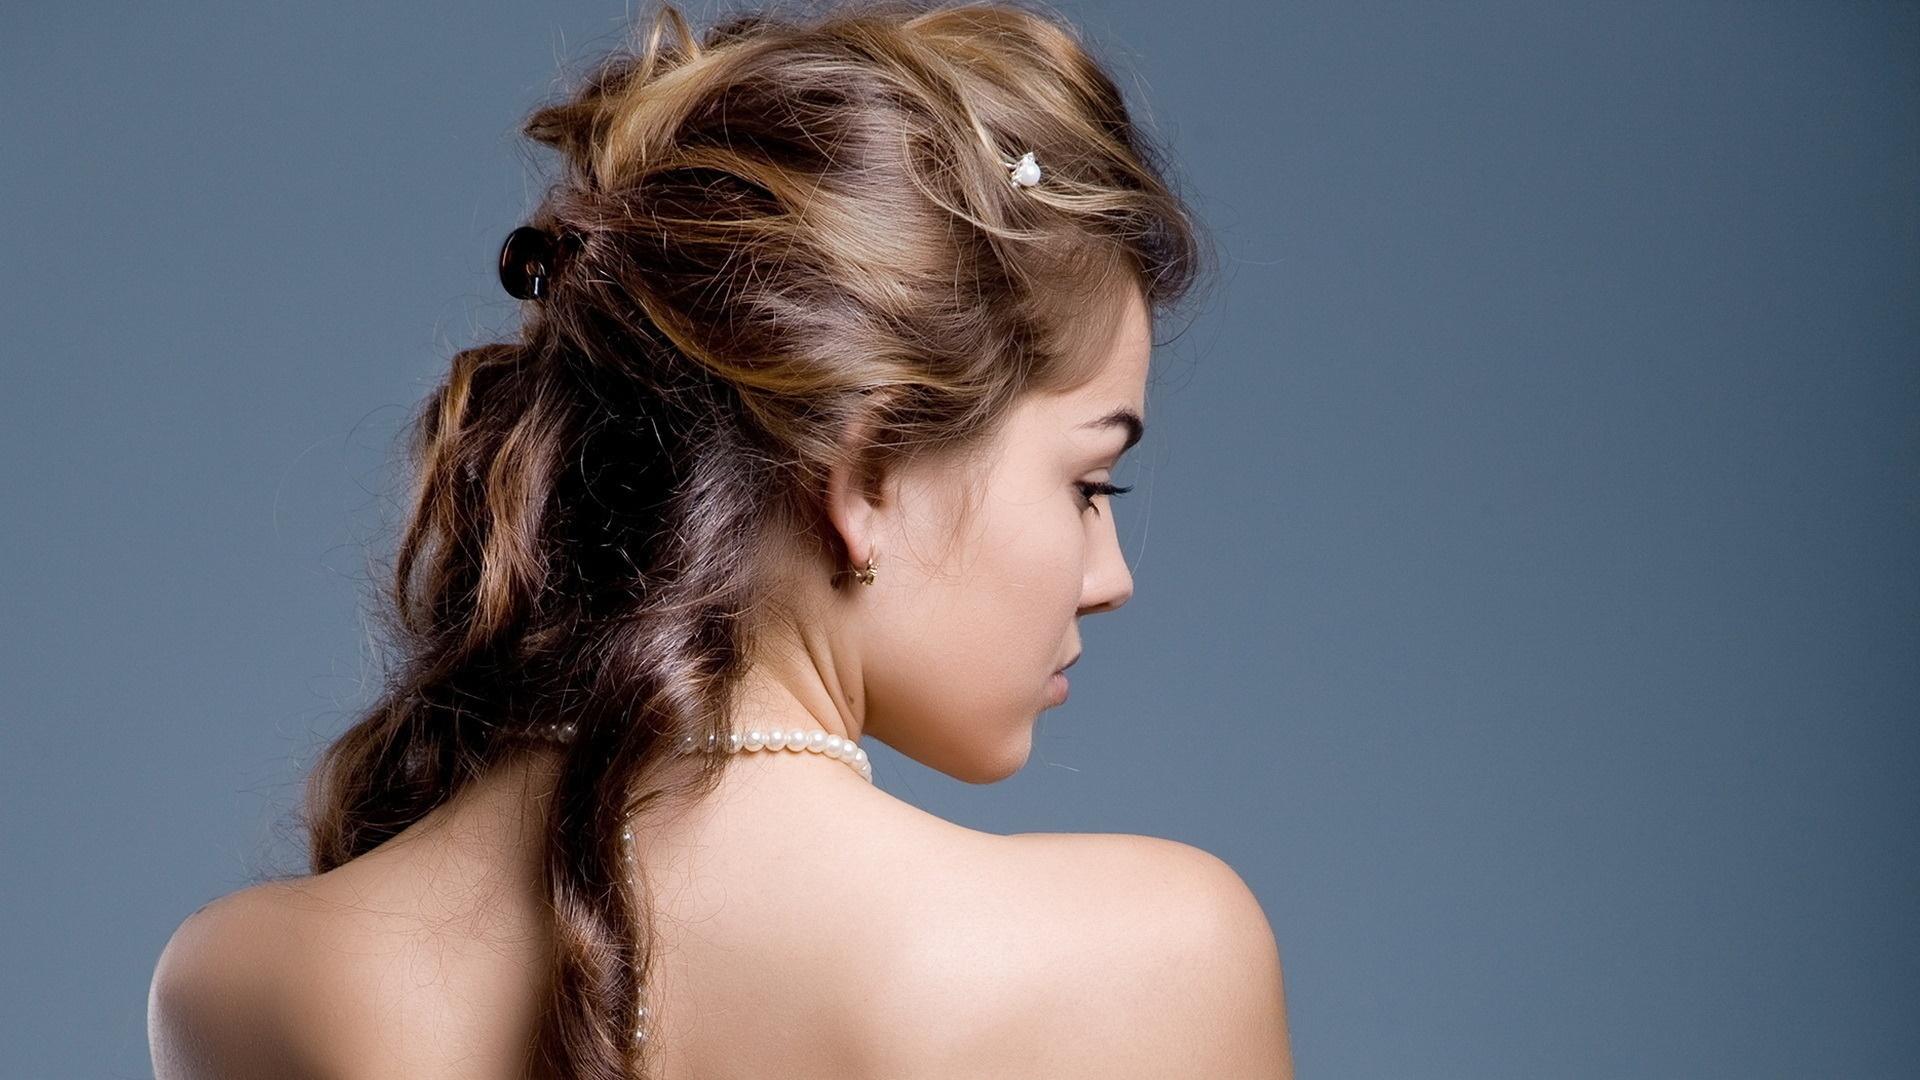 Robin's Hair & Beauty Salon